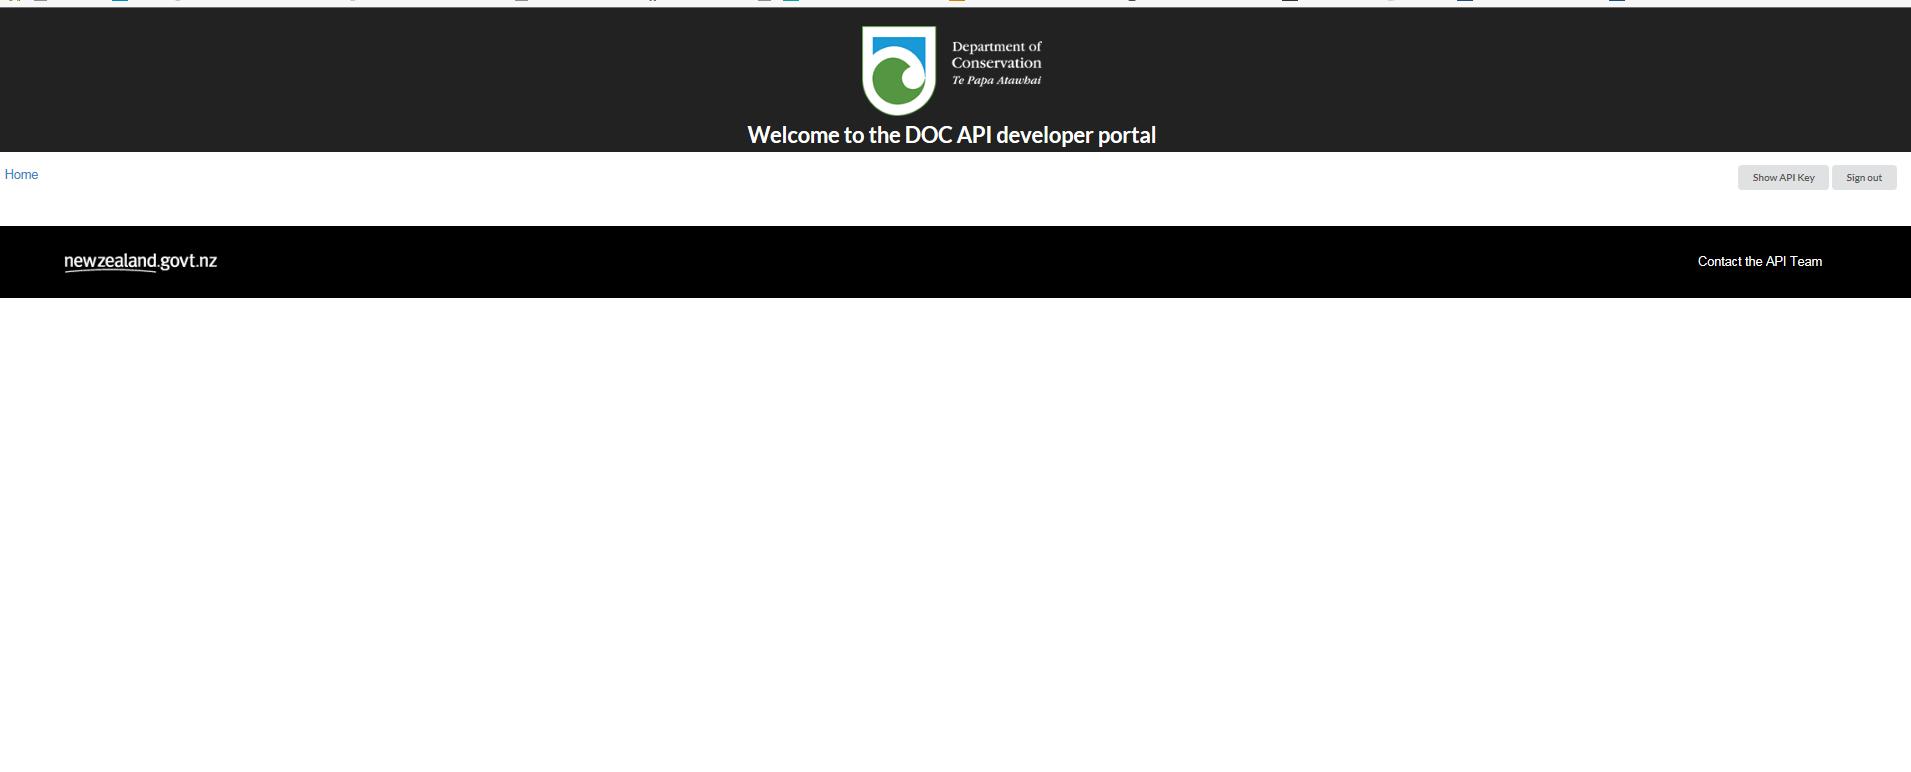 Browser issue - Dev portal doesn't work on Internet explorer